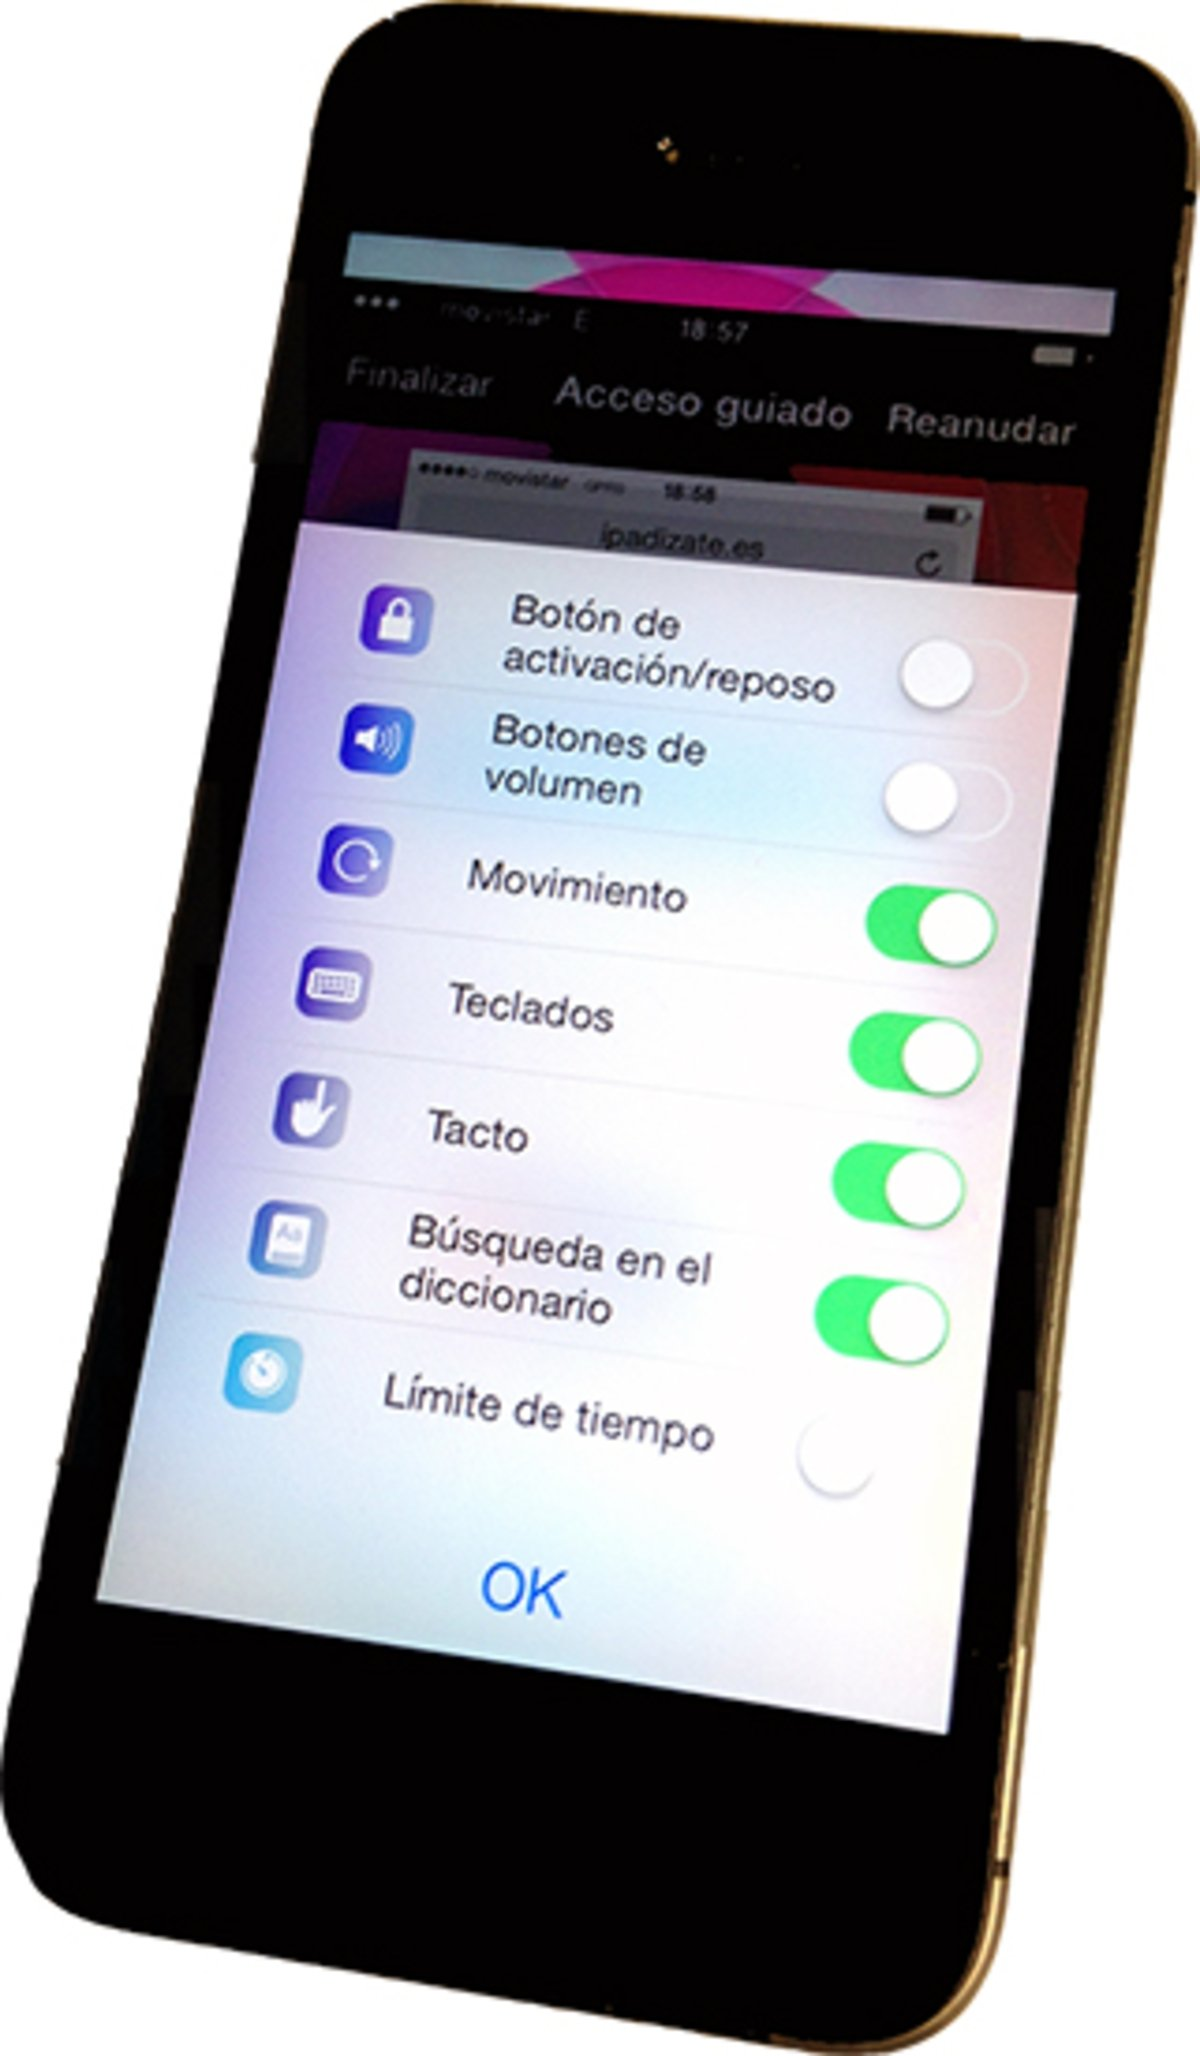 bloquear-aplicacion-ipad-iphone-6